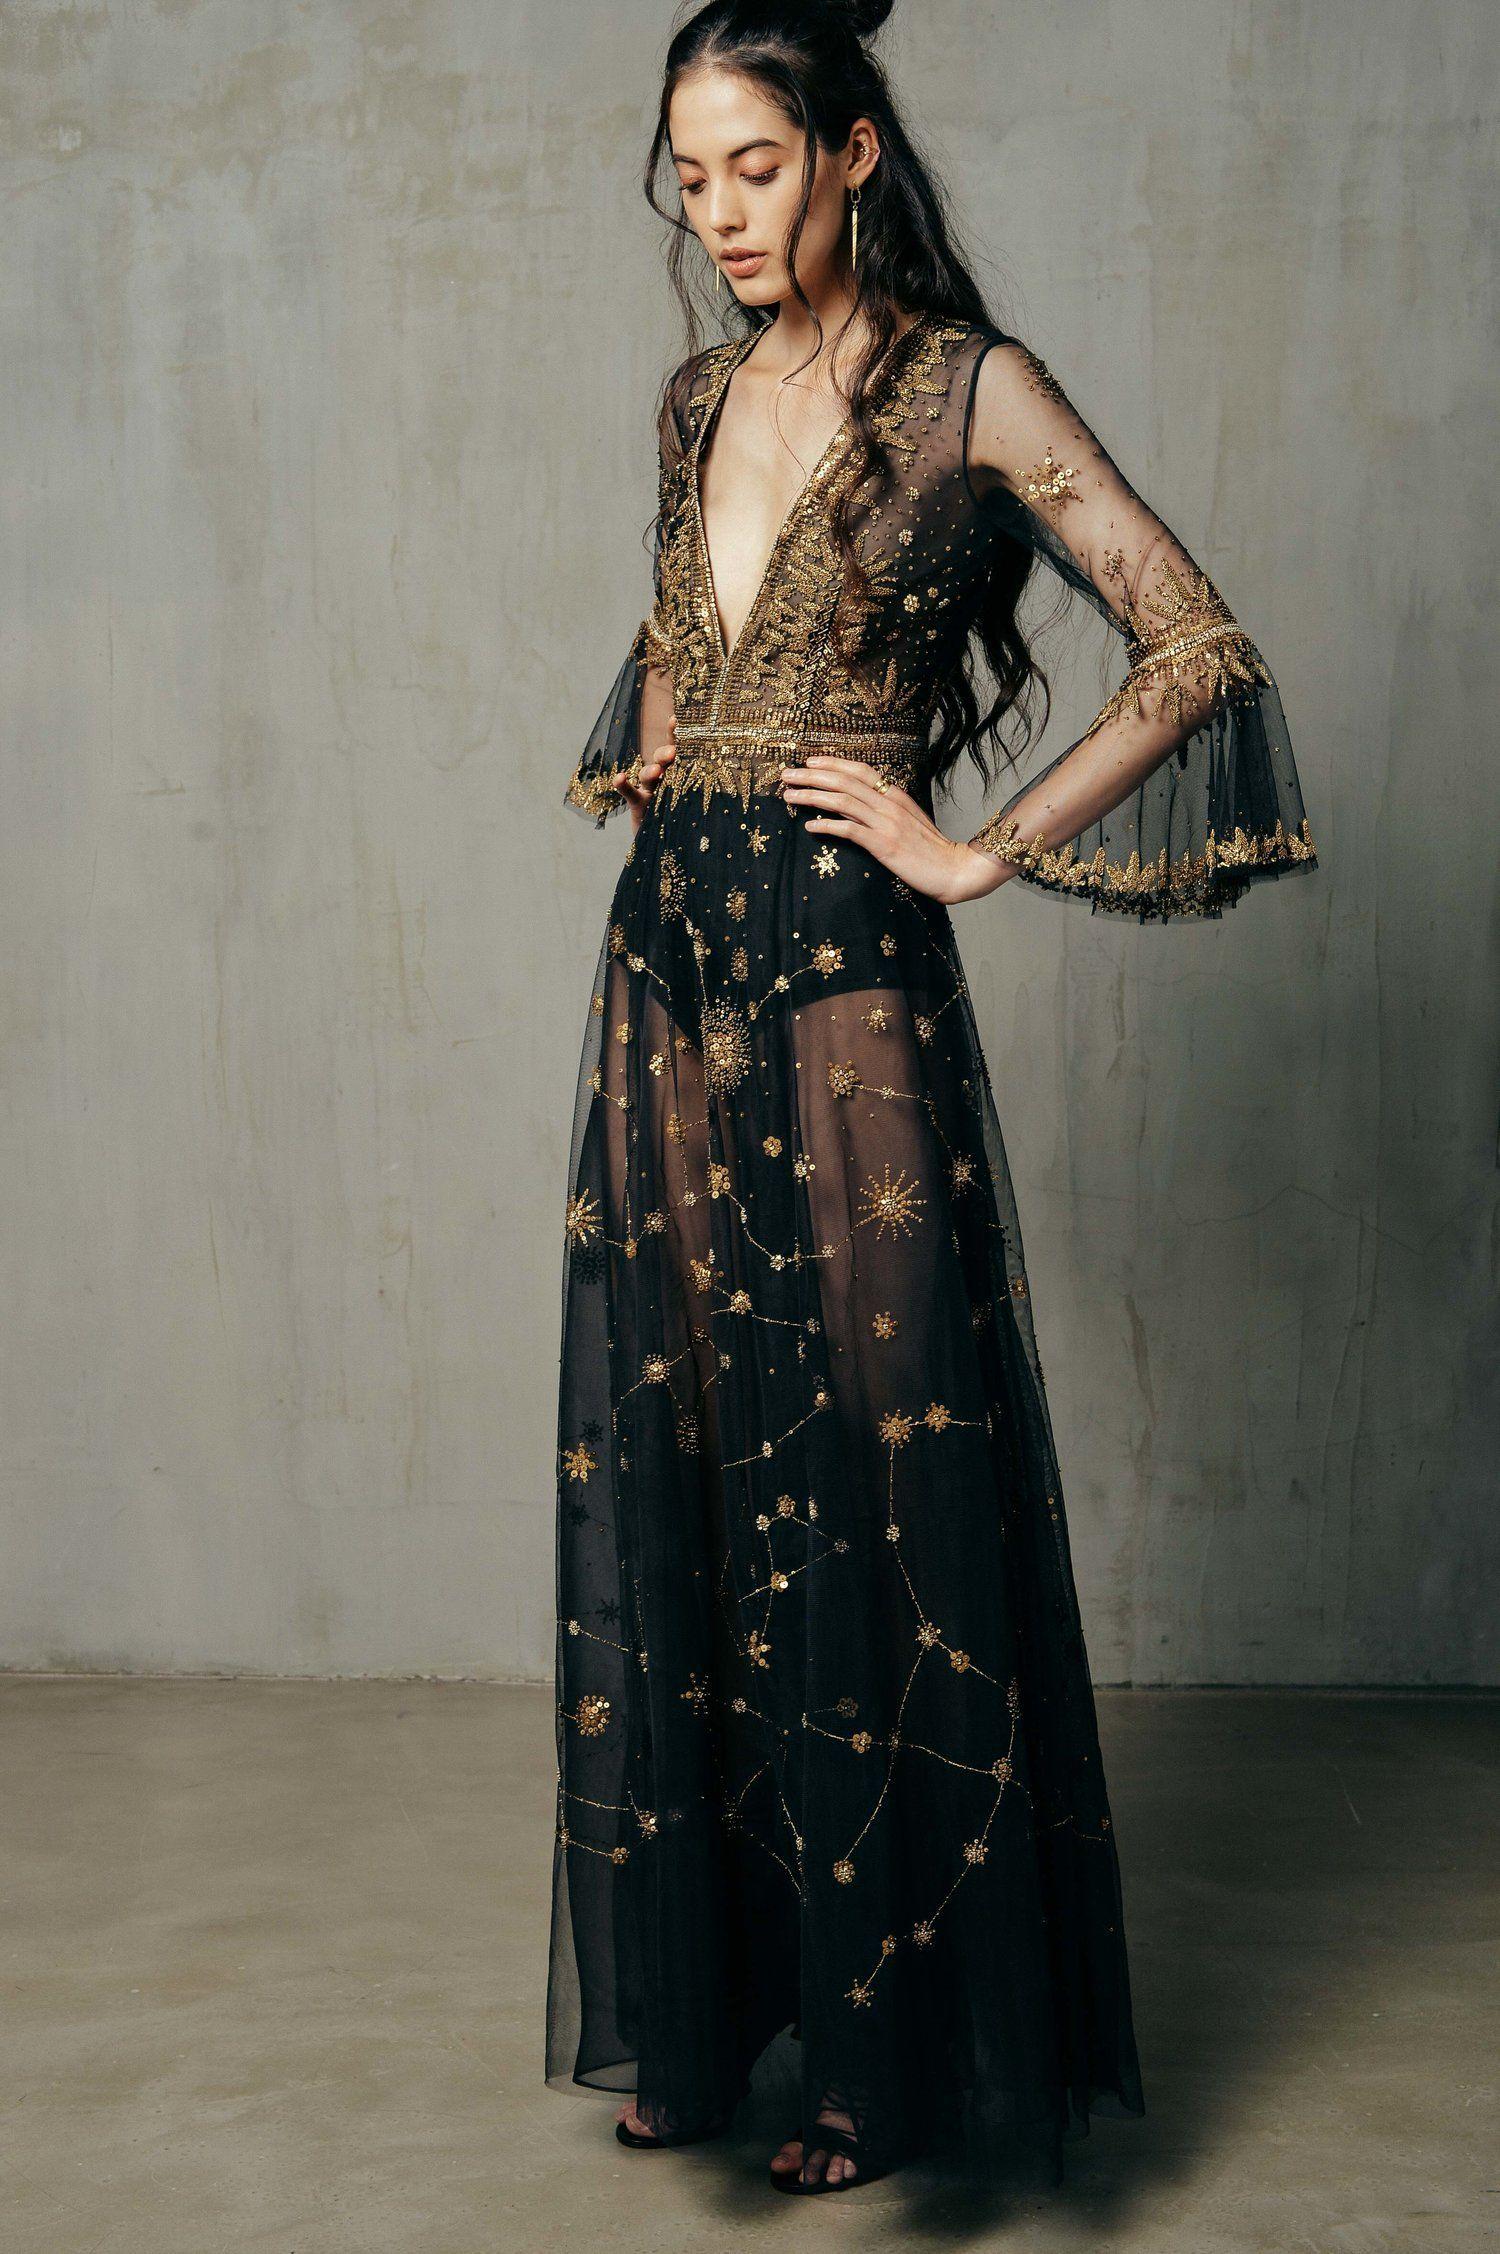 dcb464d8e93e HERA CONSTELLATION — CUCCULELLI SHAHEEN #womensfashion Gold Dress, Tulle  Dress, Dress Black,